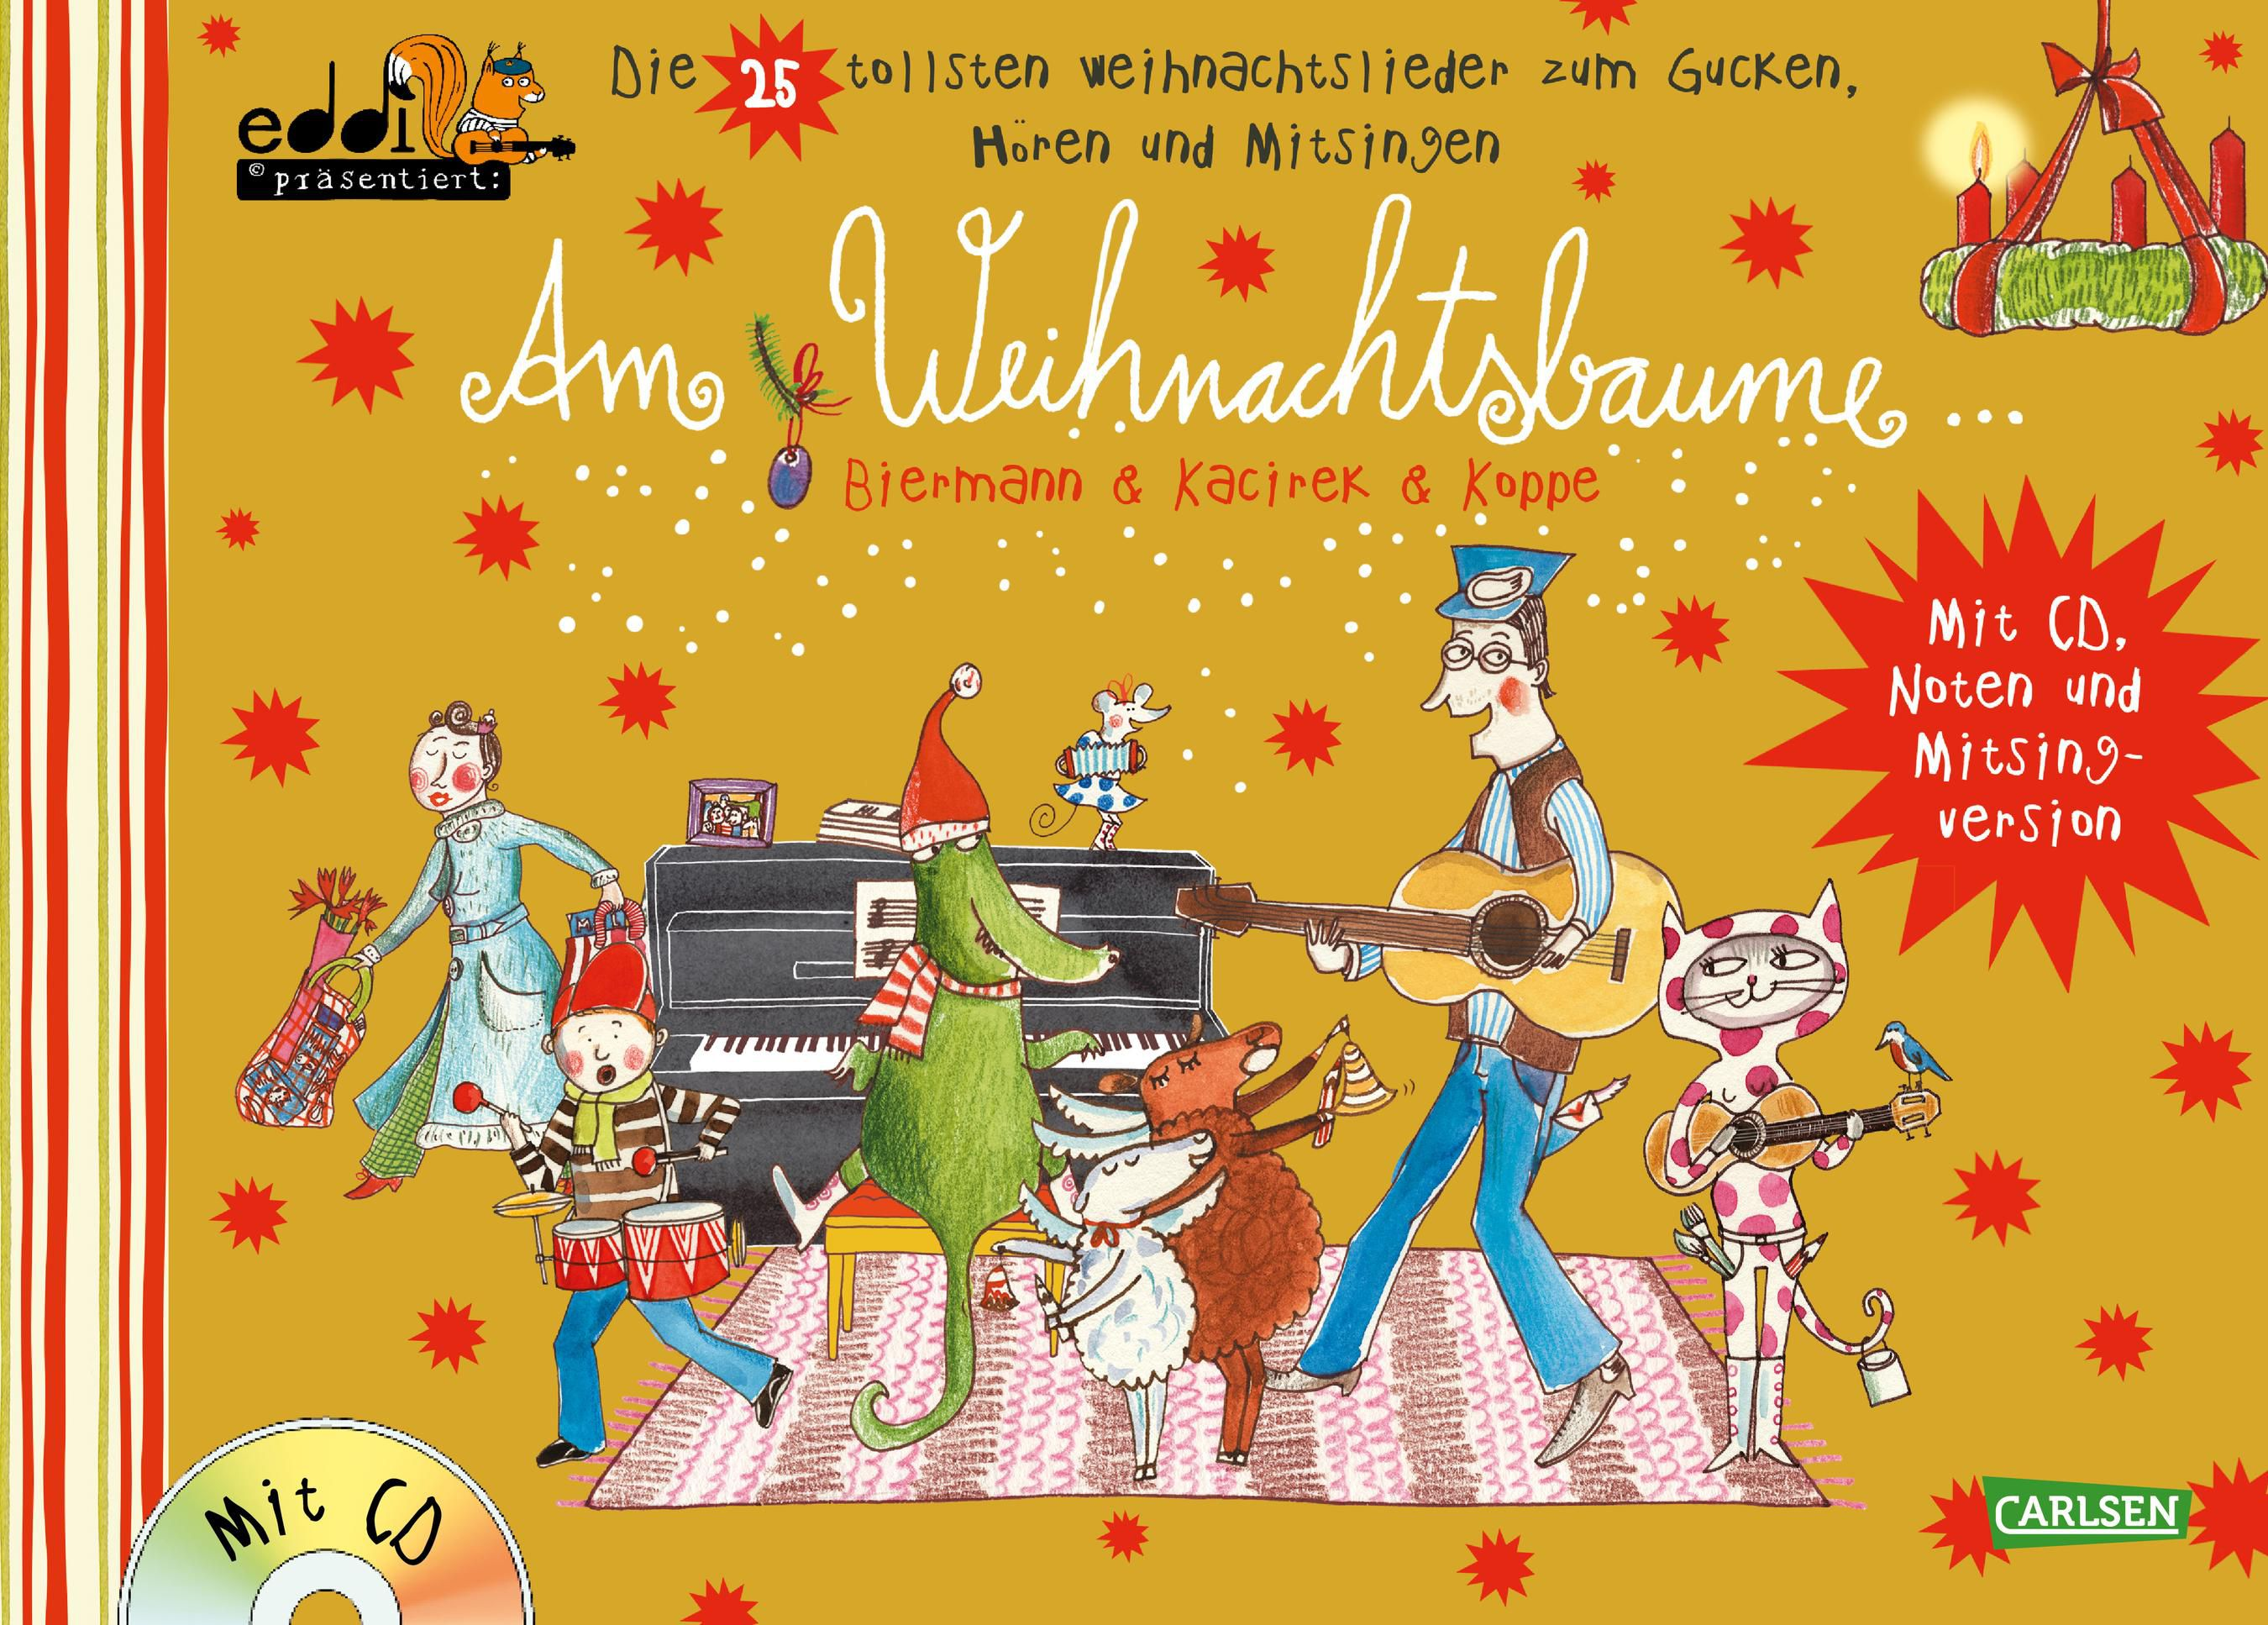 Am Weihnachtsbaume GOLD Franziska Biermann - Fürstenberg, Deutschland - Am Weihnachtsbaume GOLD Franziska Biermann - Fürstenberg, Deutschland